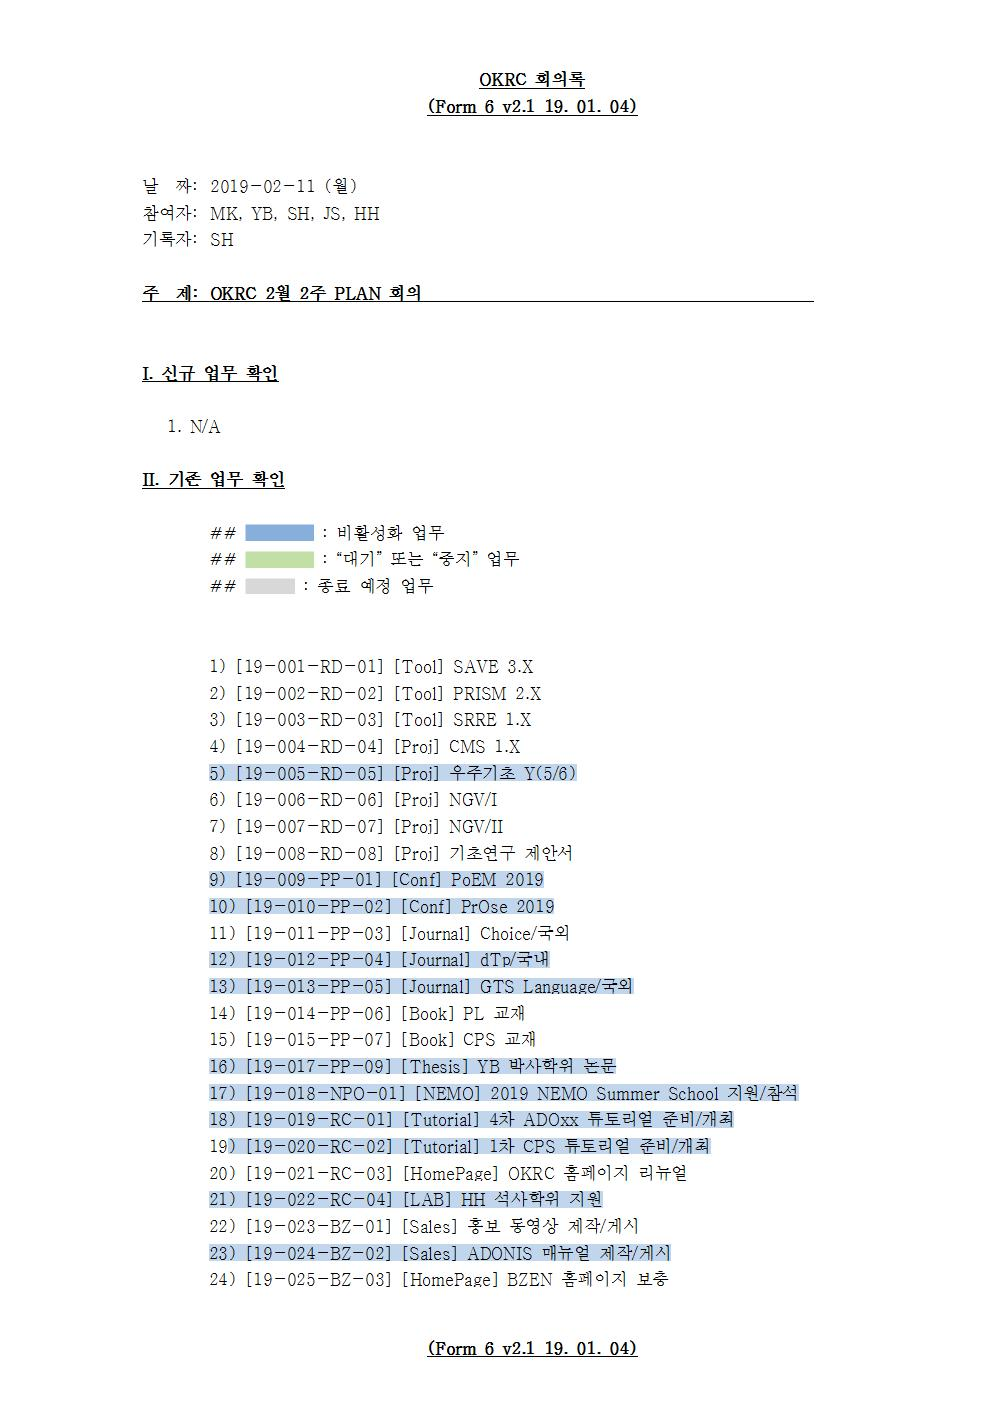 1-Mon-2019-02-11-Minute Record-[PLAN]001.jpg